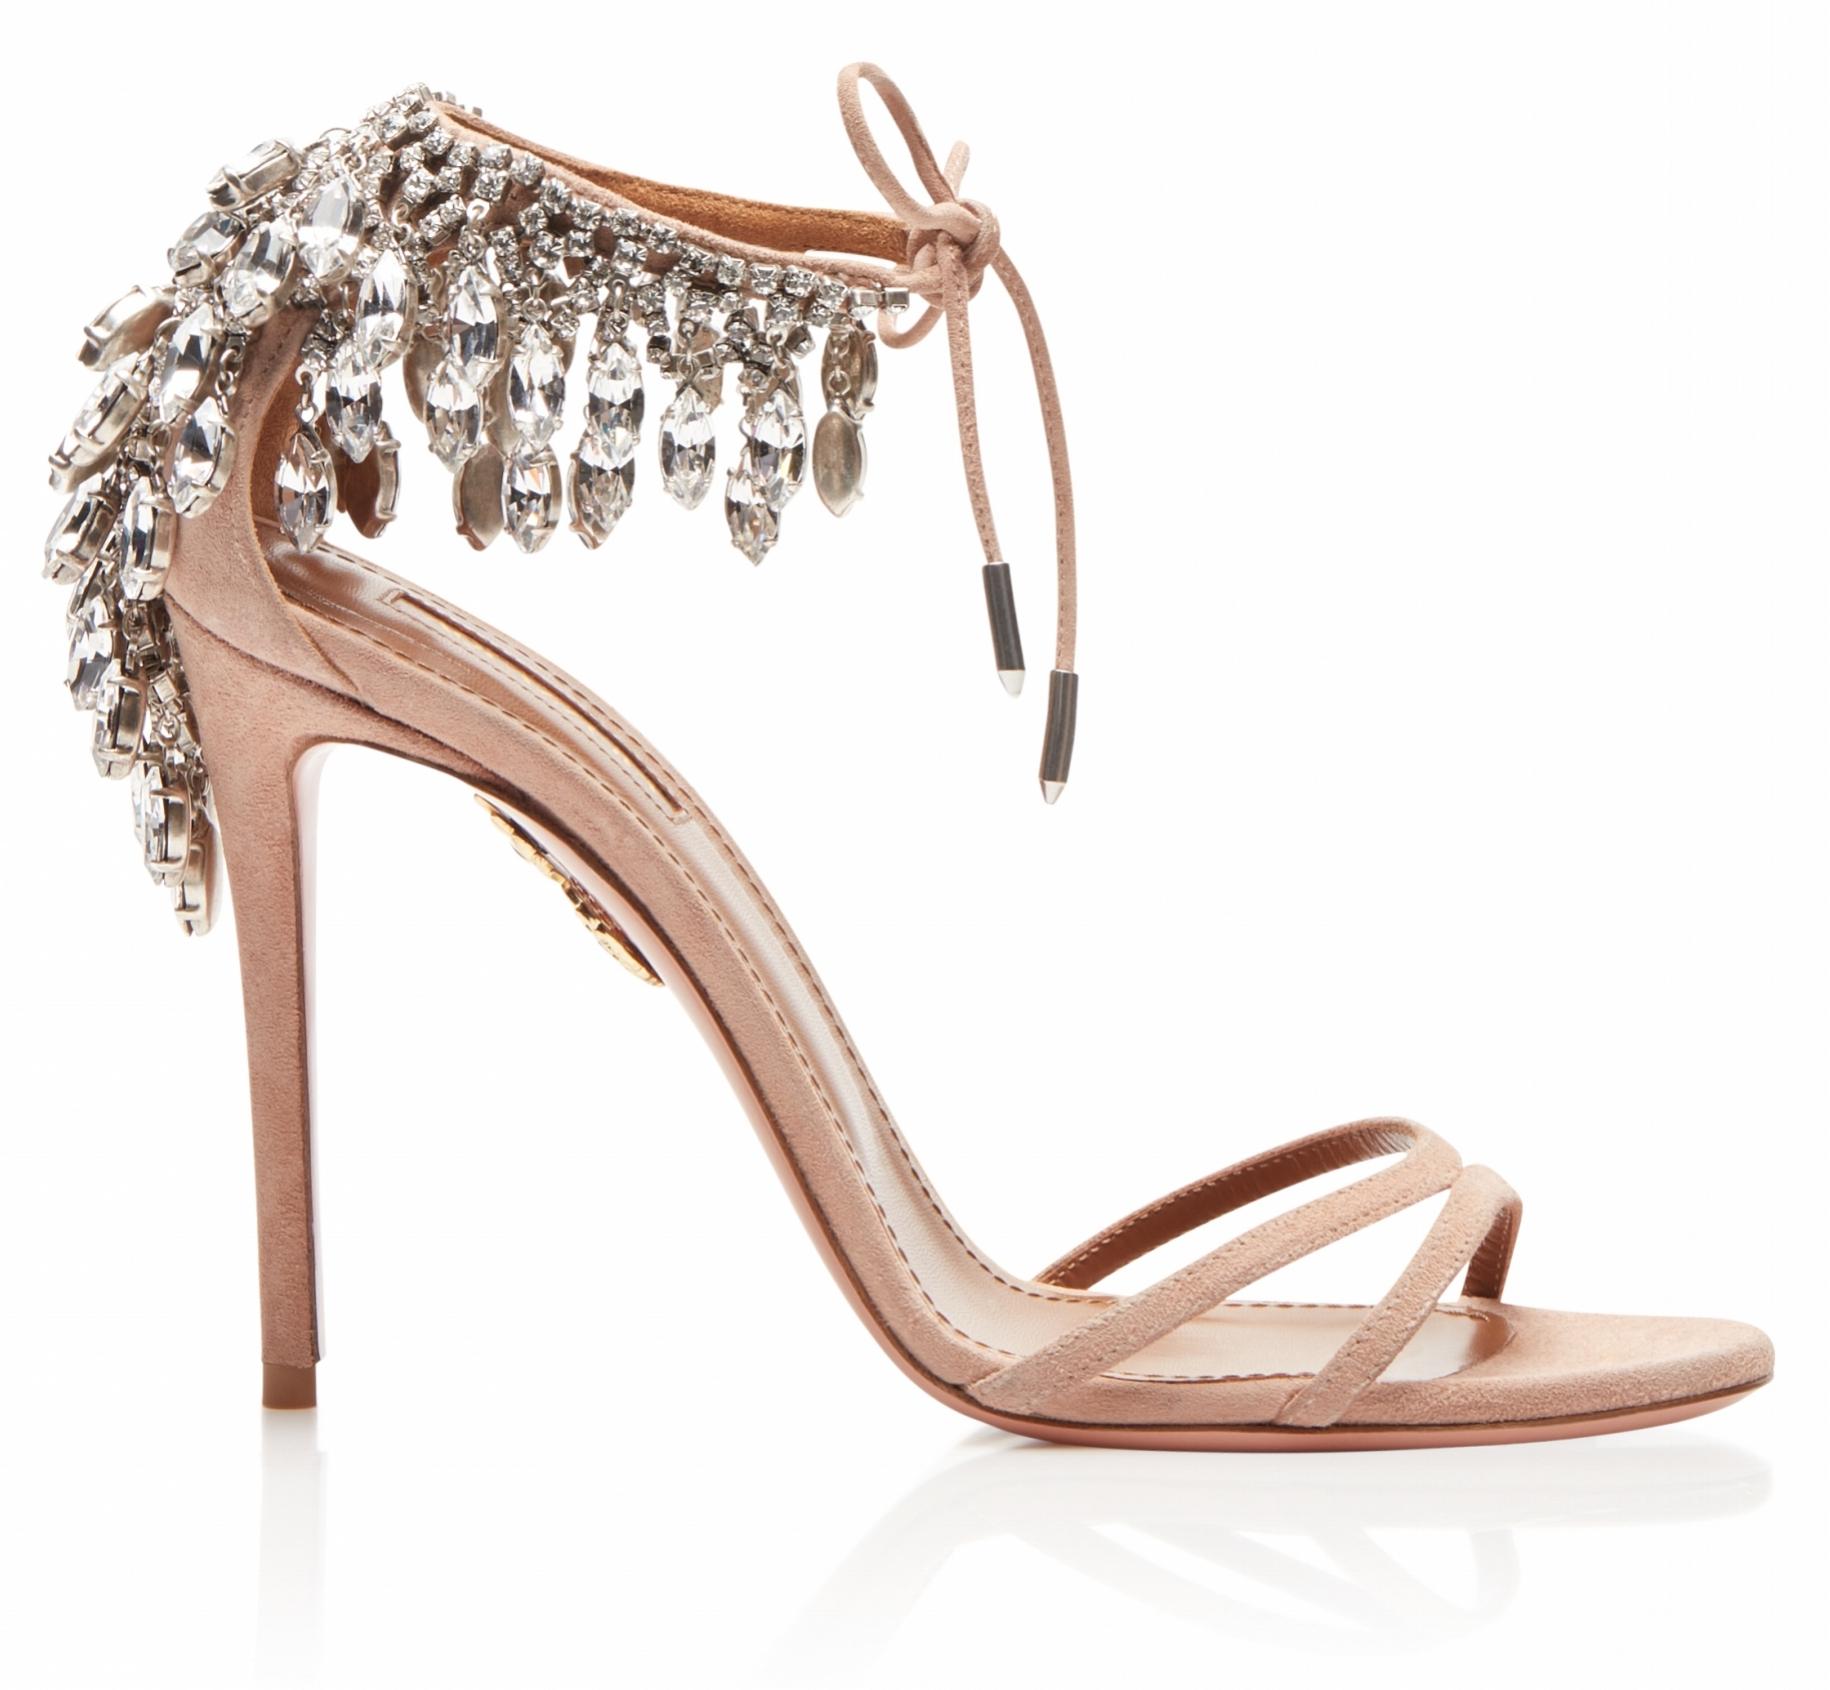 Aquazzura-Heels-Eden-sandal-105-Powder-pink-Suede-with-crystal-Right.jpg